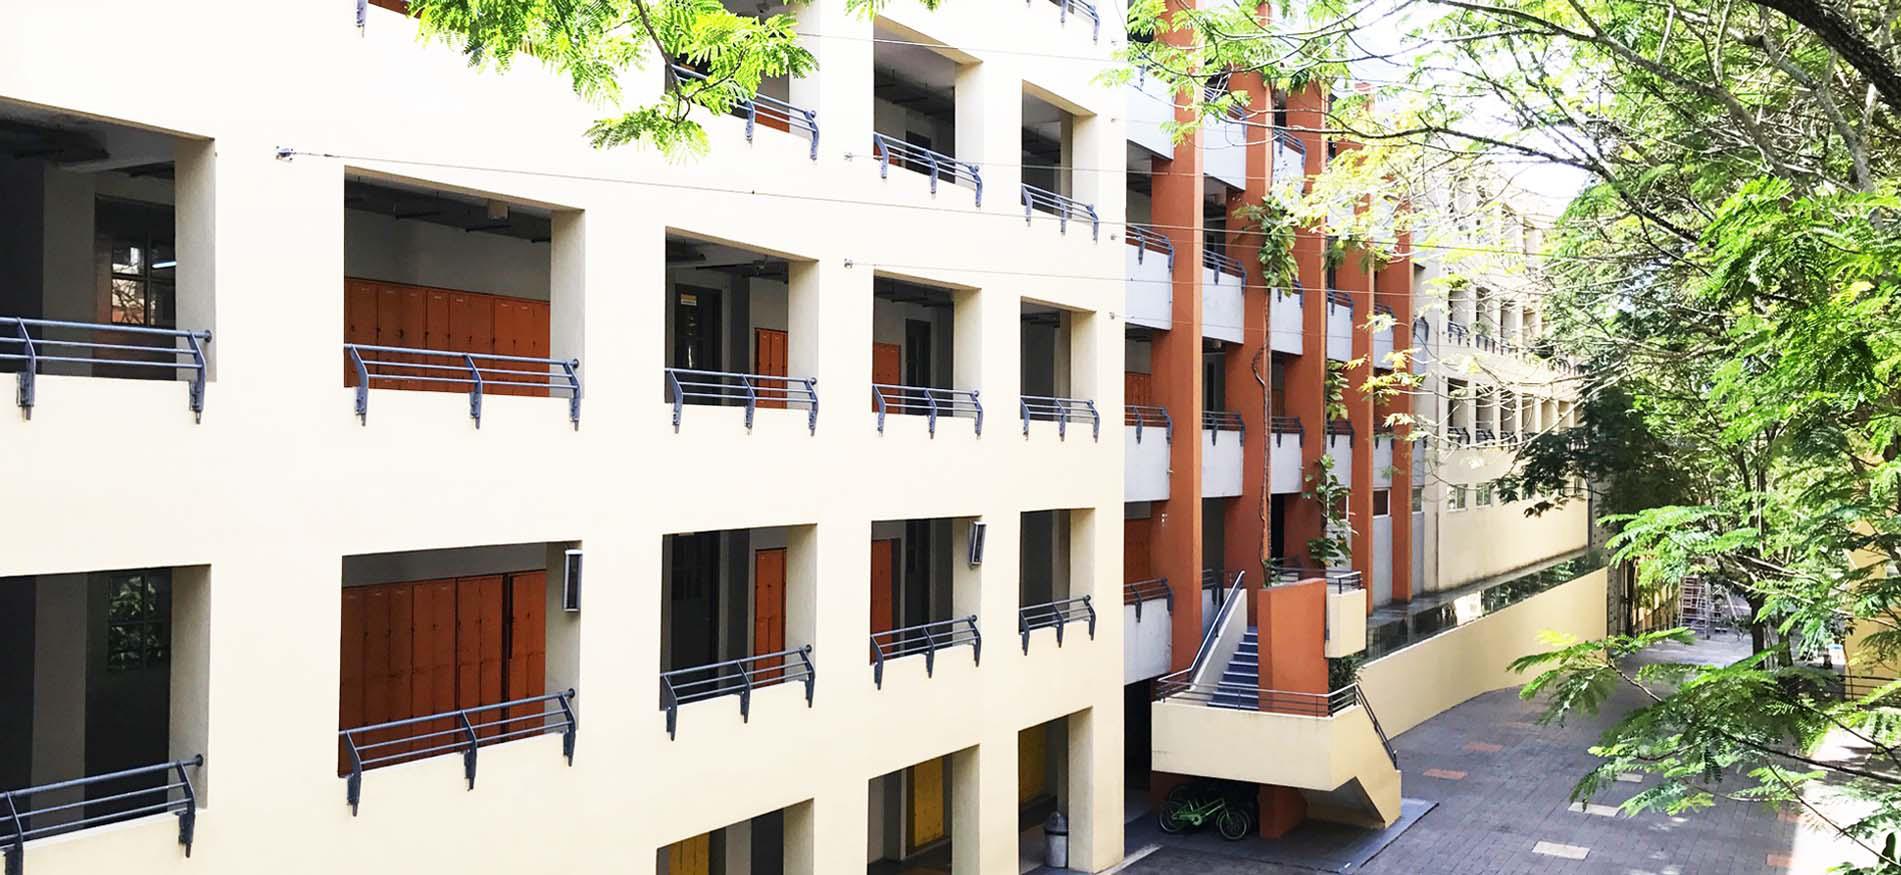 Cempaka International School, Cheras